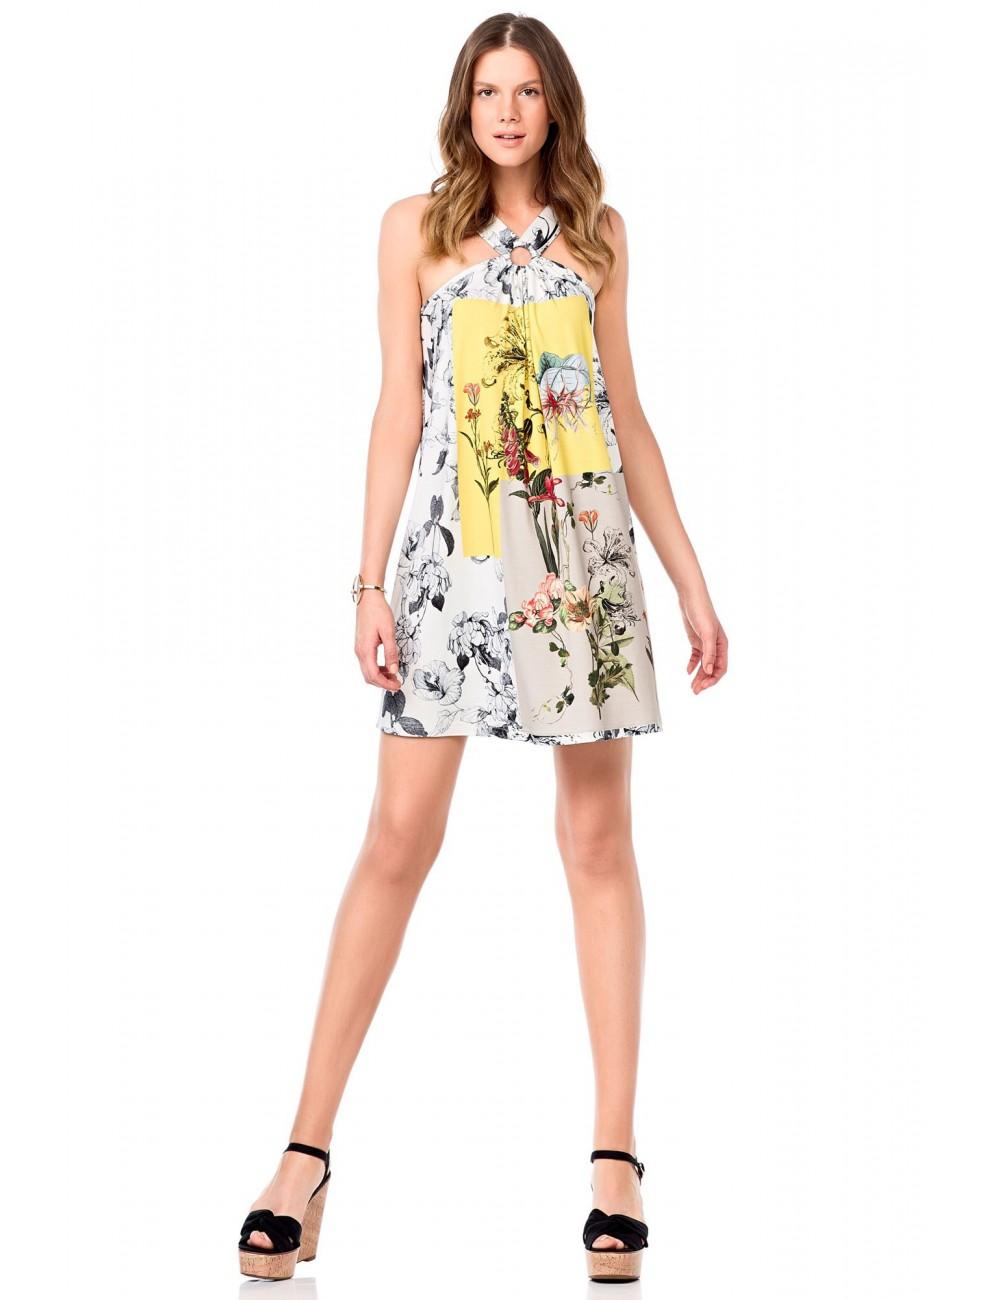 ae095687f1c Καλοκαιρινό μίνι φόρεμα με τιράντα, Vamp 6942